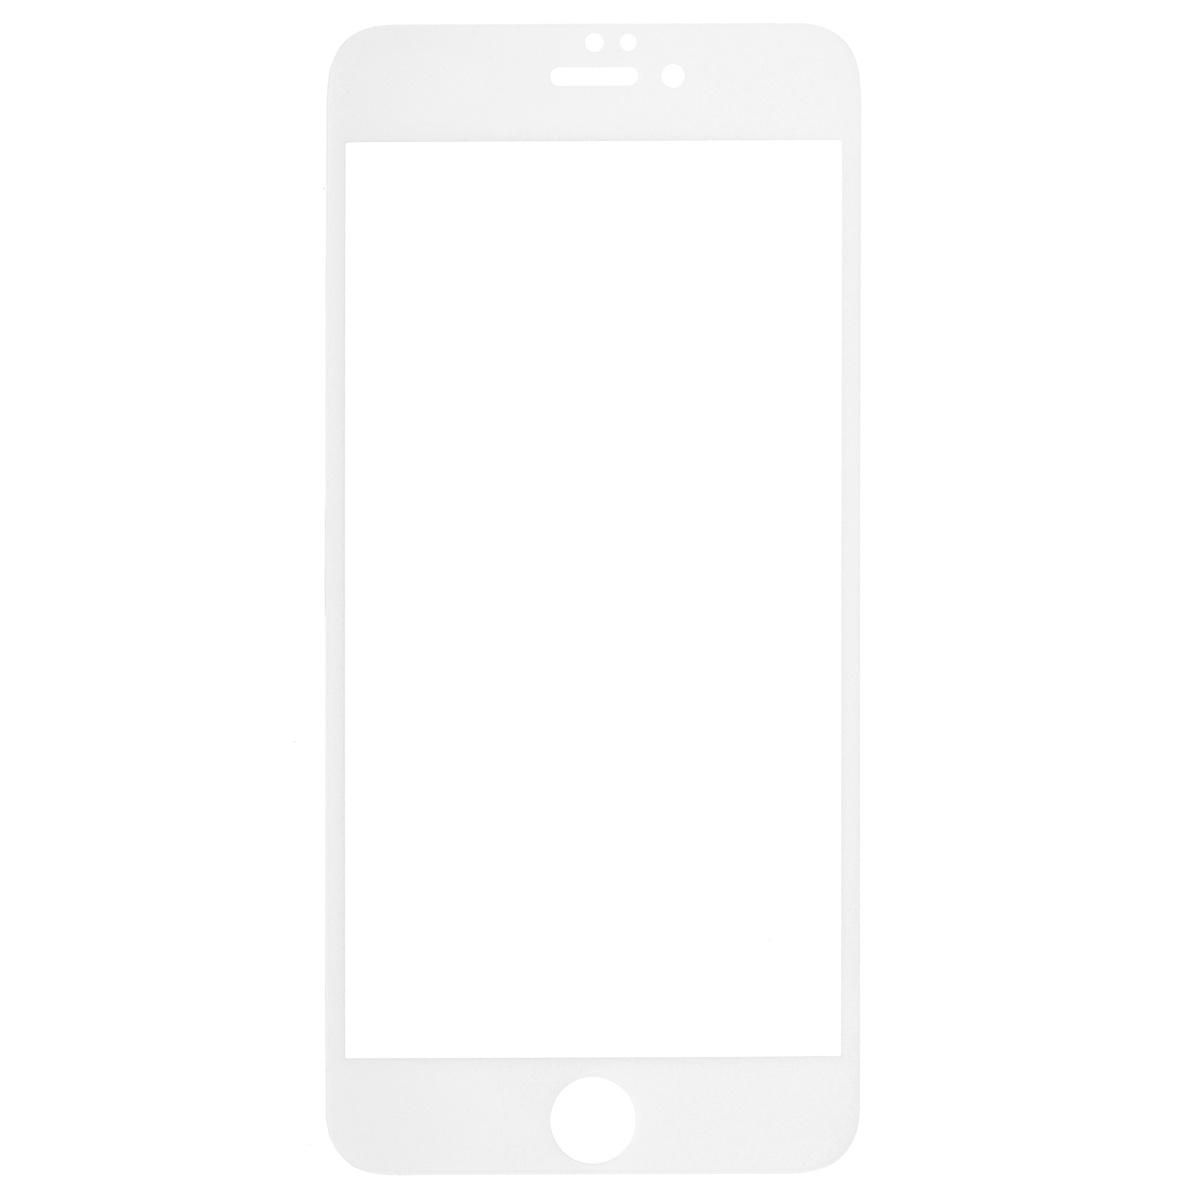 Highscreen защитное стекло для iPhone 6 Plus, белая рамка стекло защитное для айфон 6 плюс 0 3мм